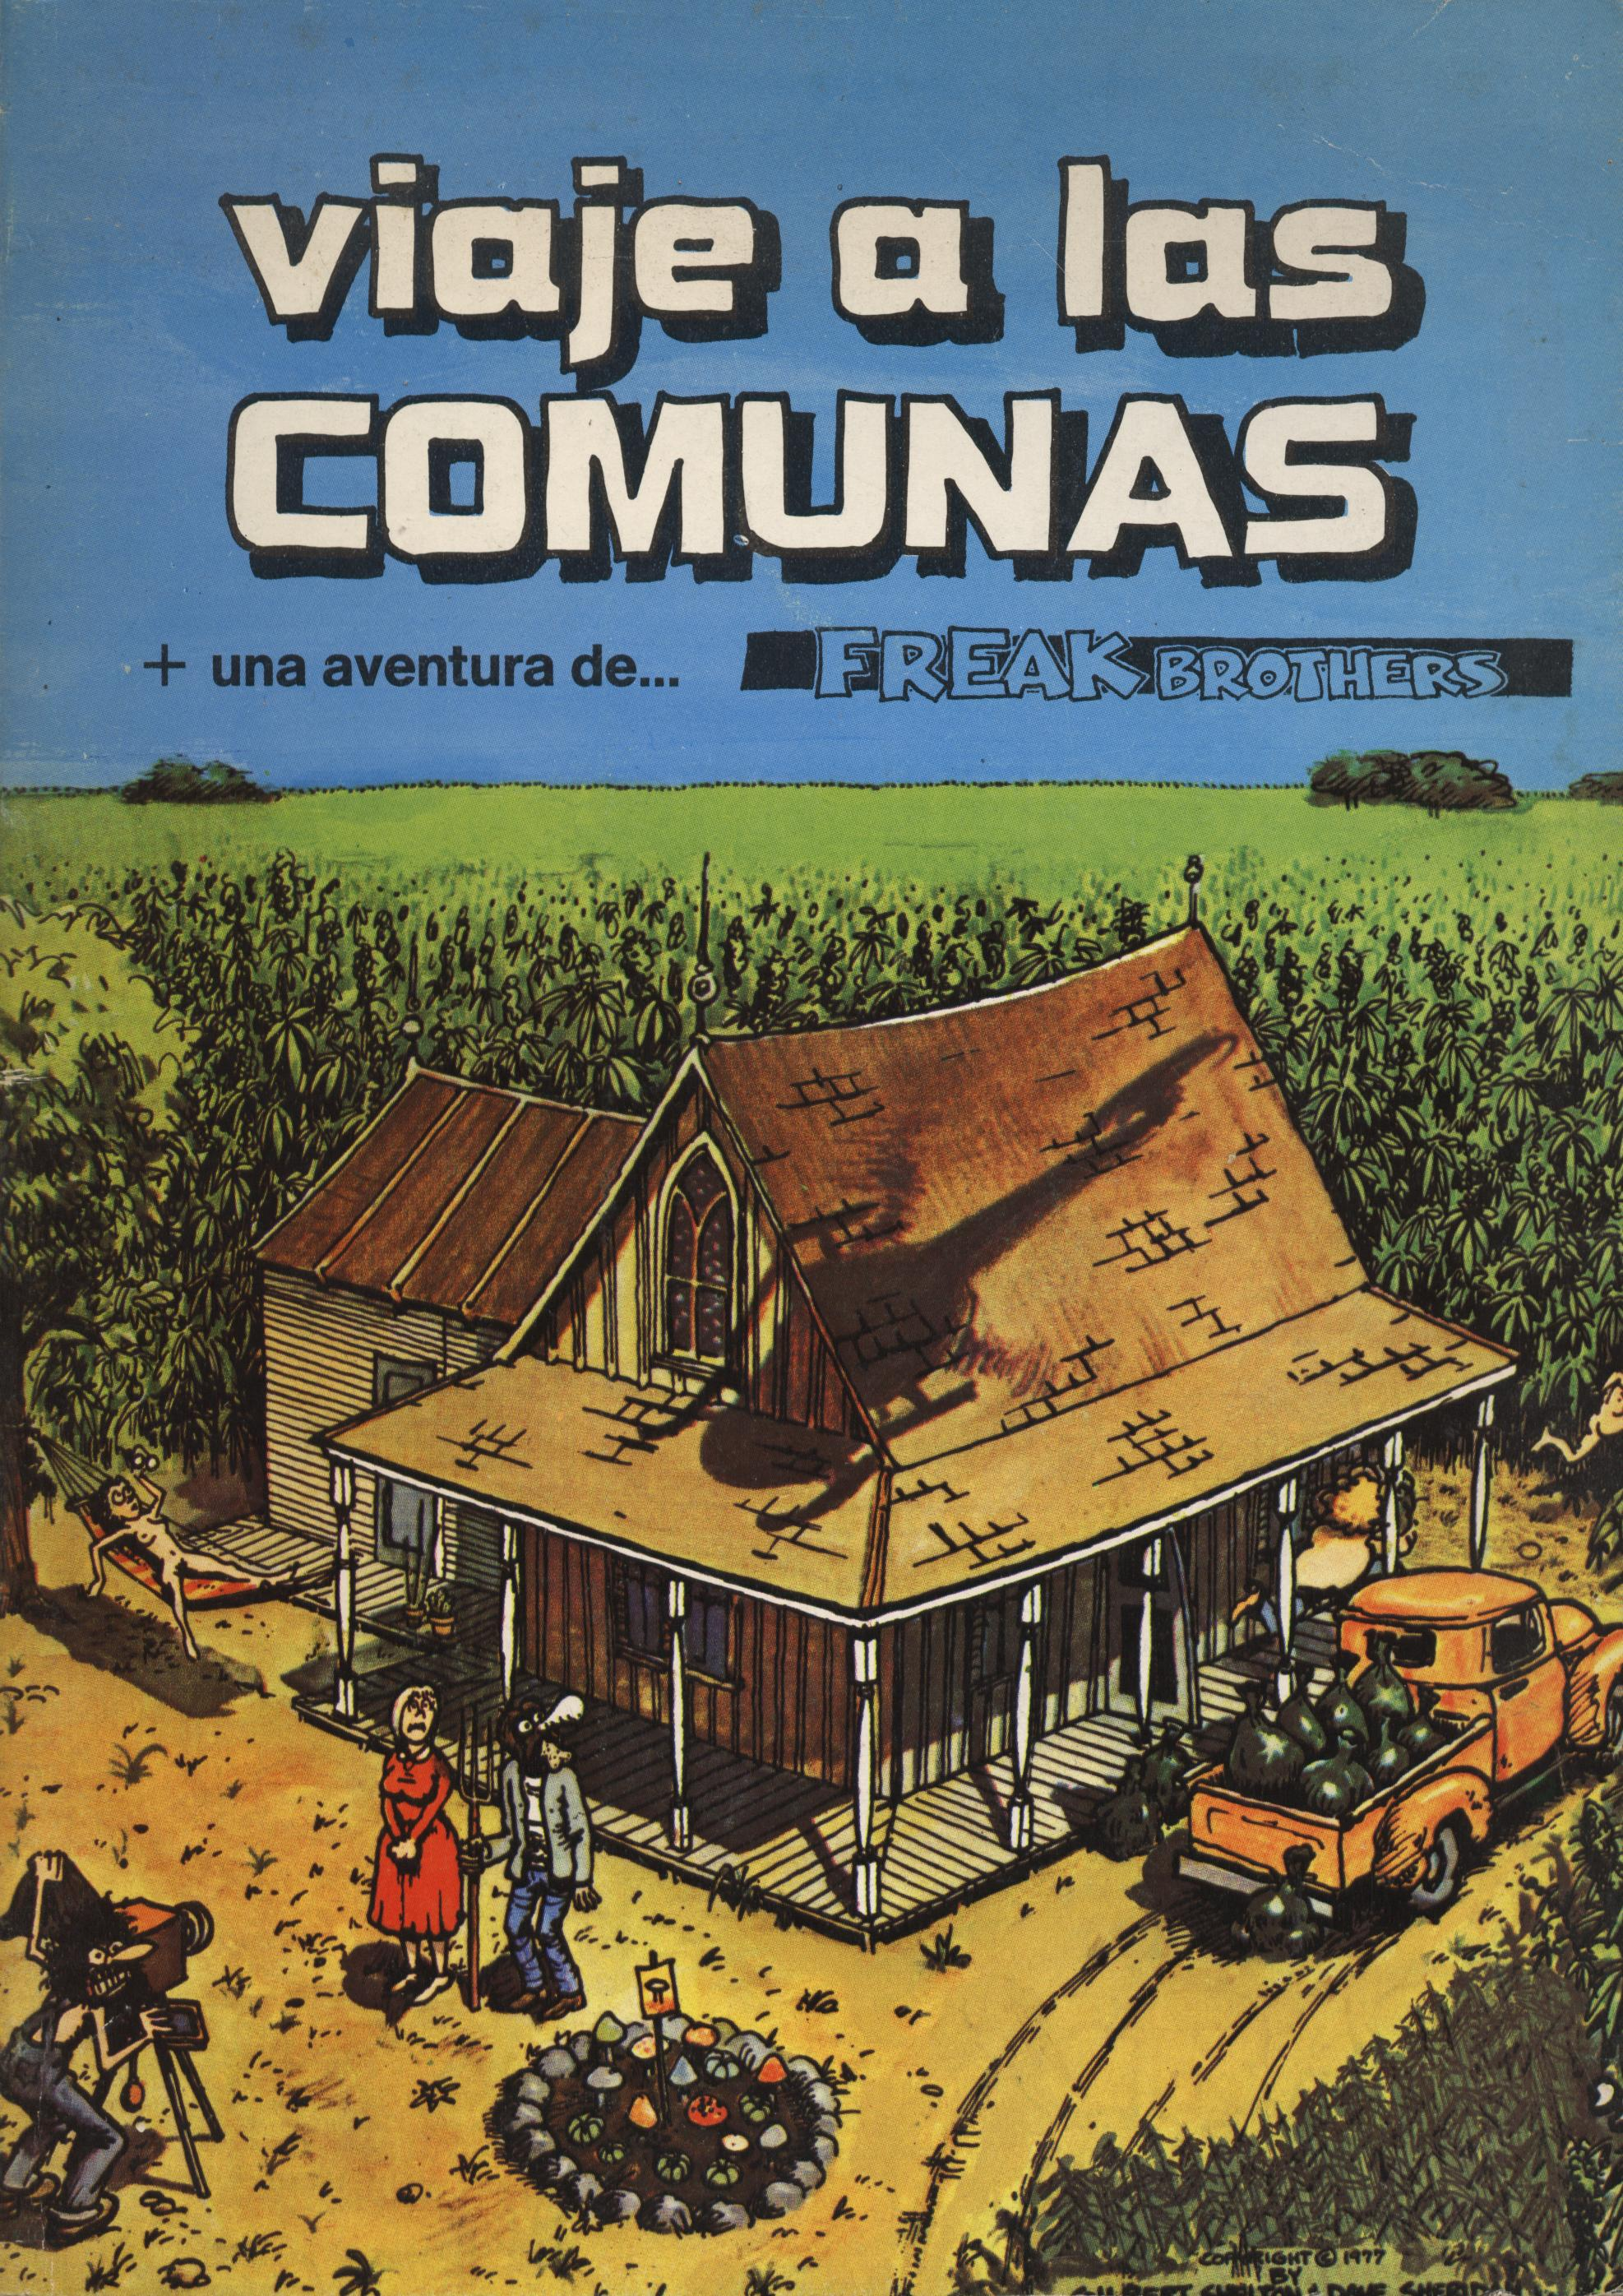 Viaje a las comunas - Gilbert Shelton